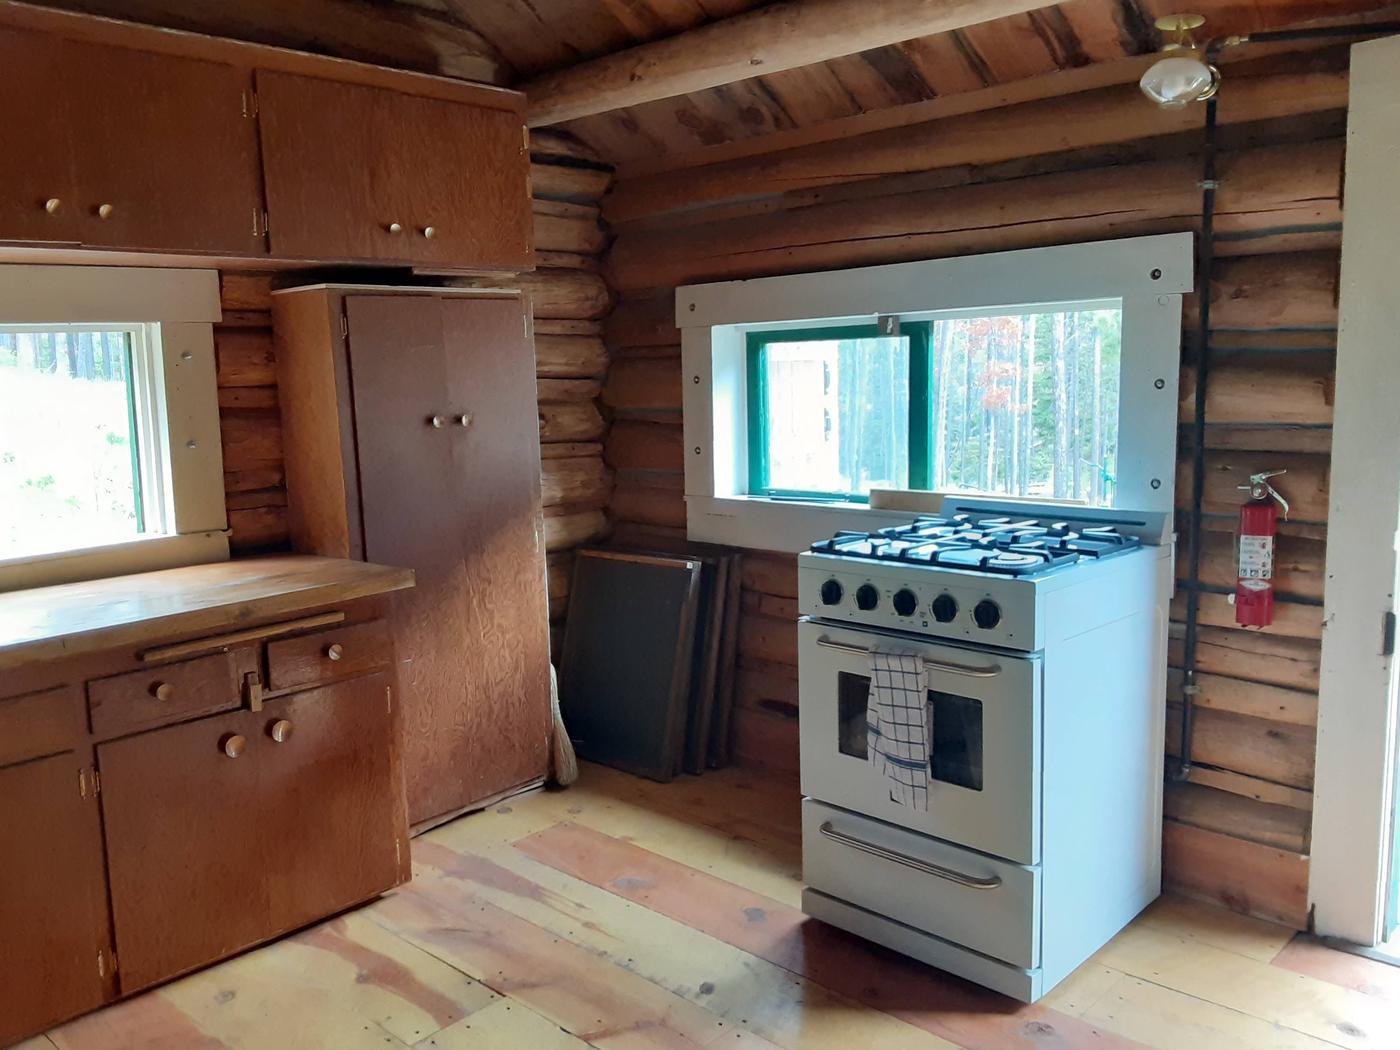 Propane stoveStove and kitchen area